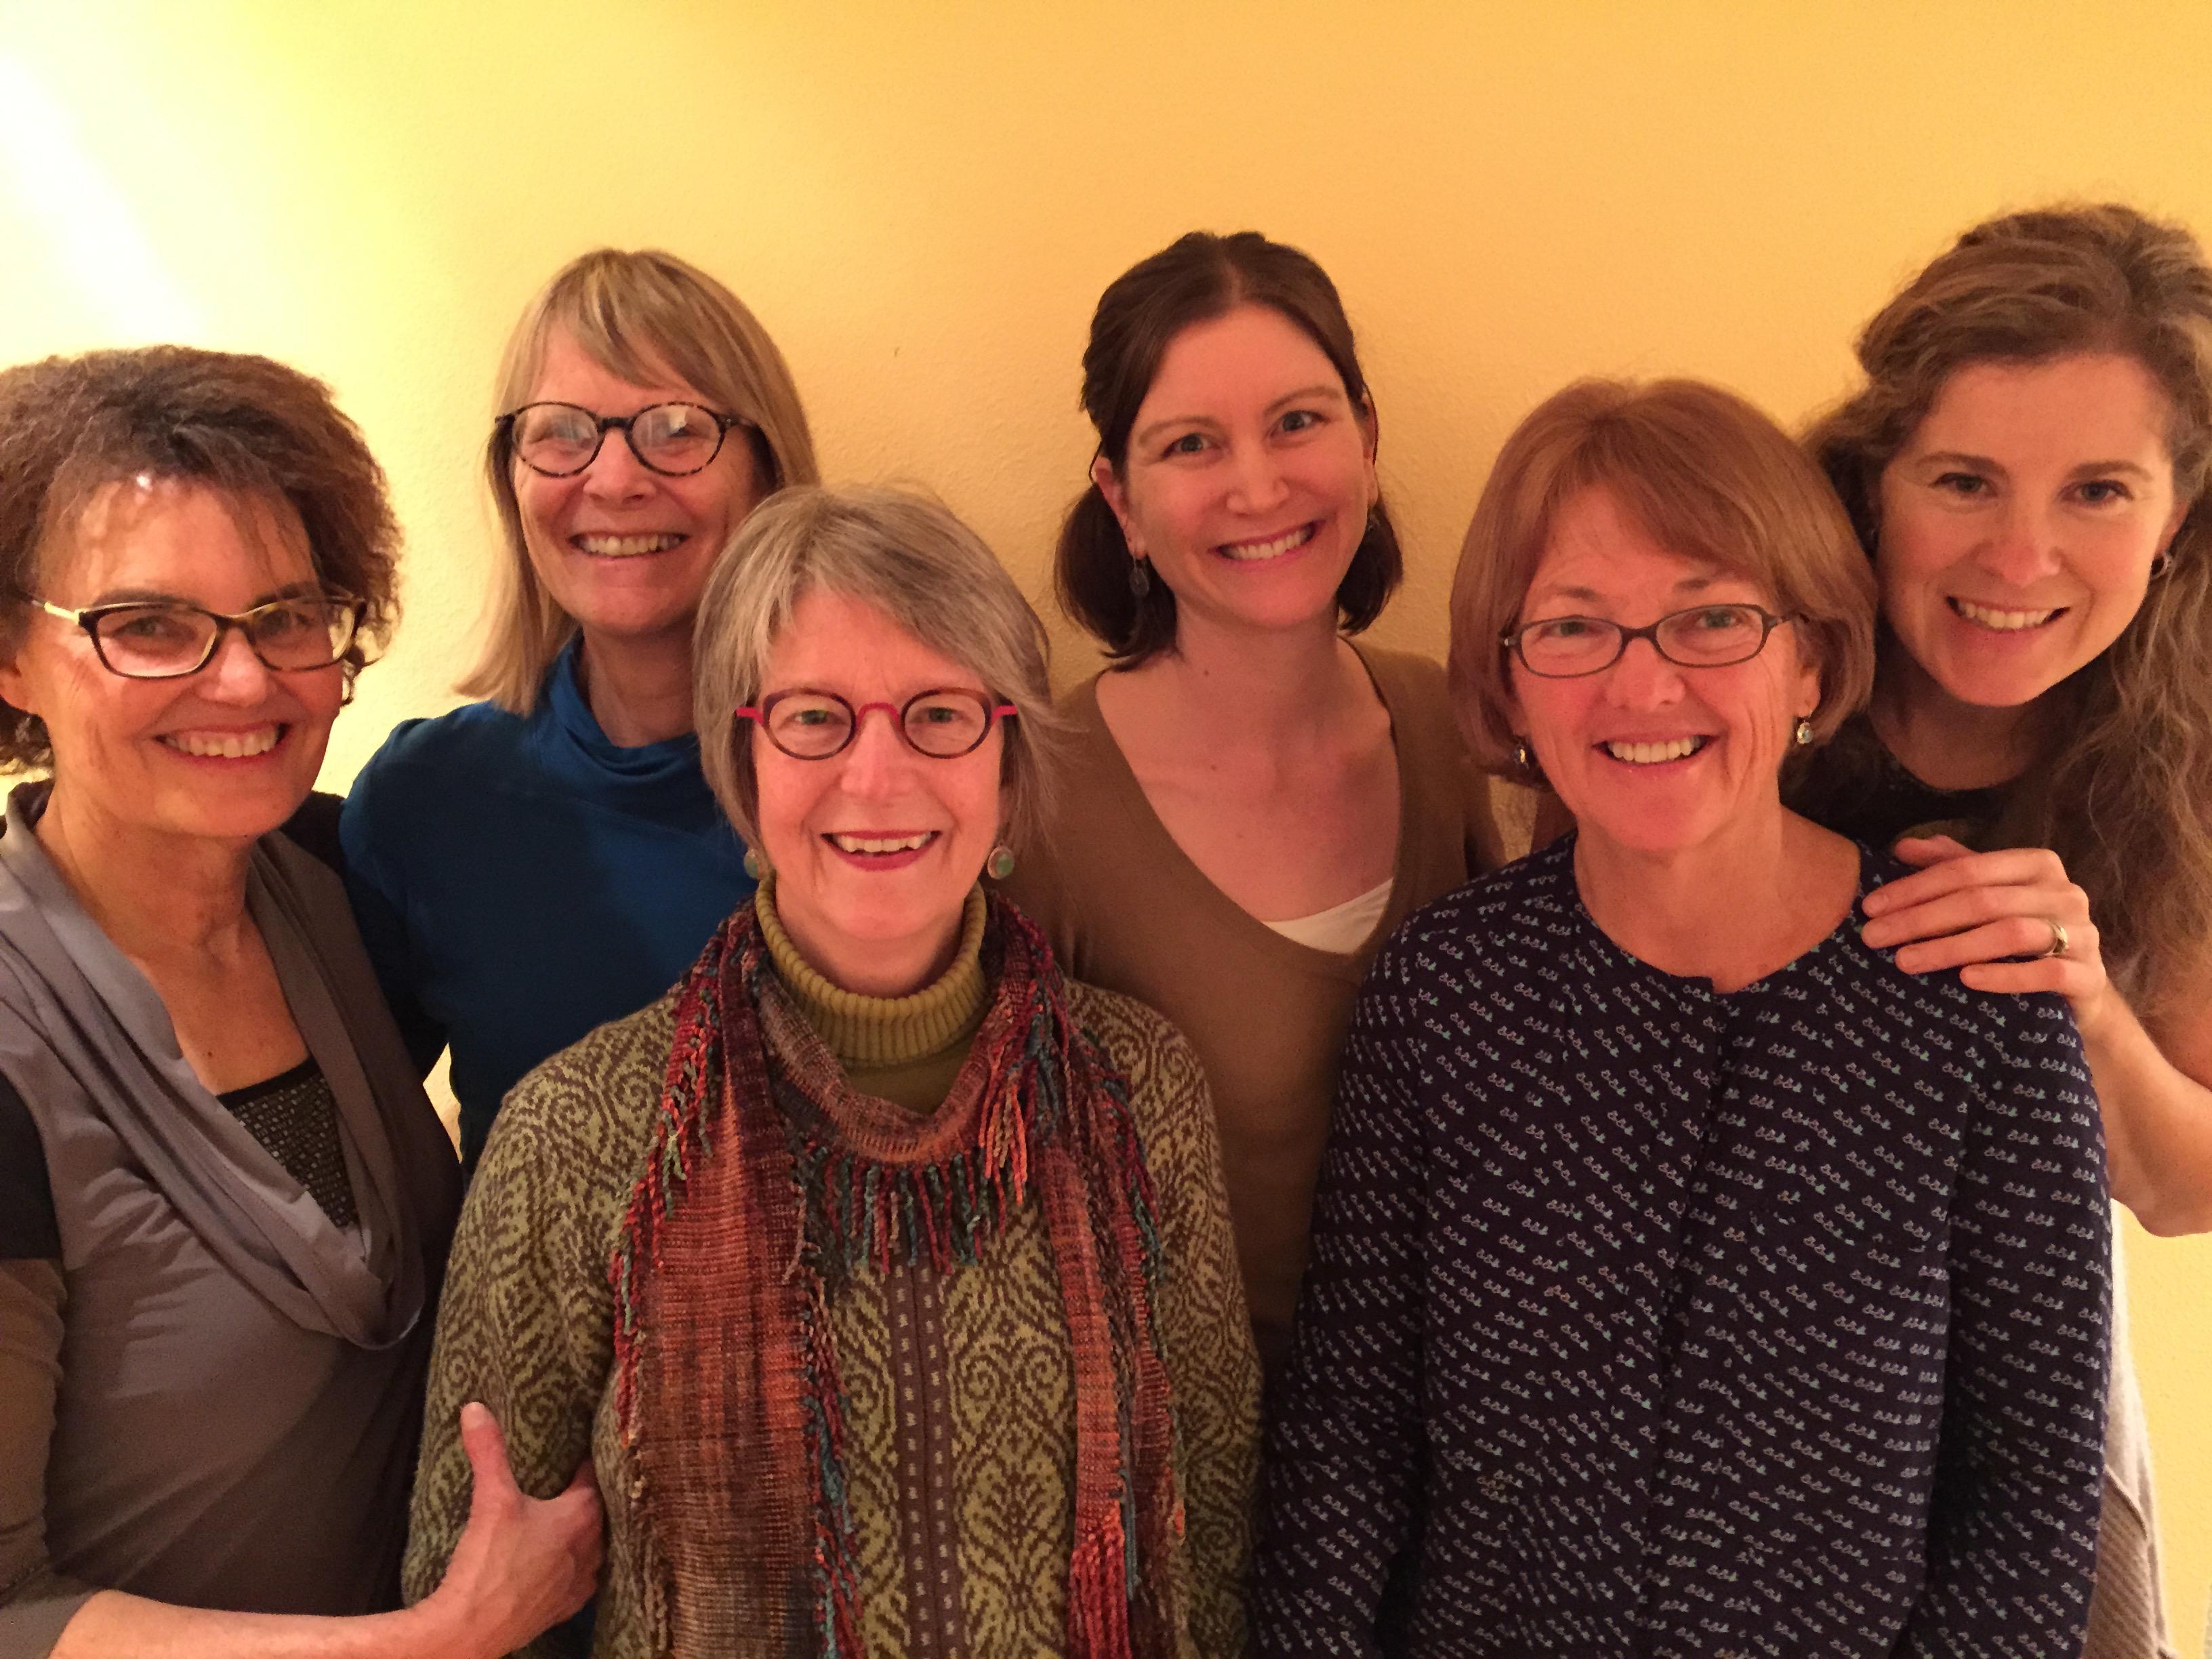 2015 SFP team: Diana Lindsay, Lynn Willeford, Shannon Arndt, Heather Racicot, Rene Neff and Debora Valis